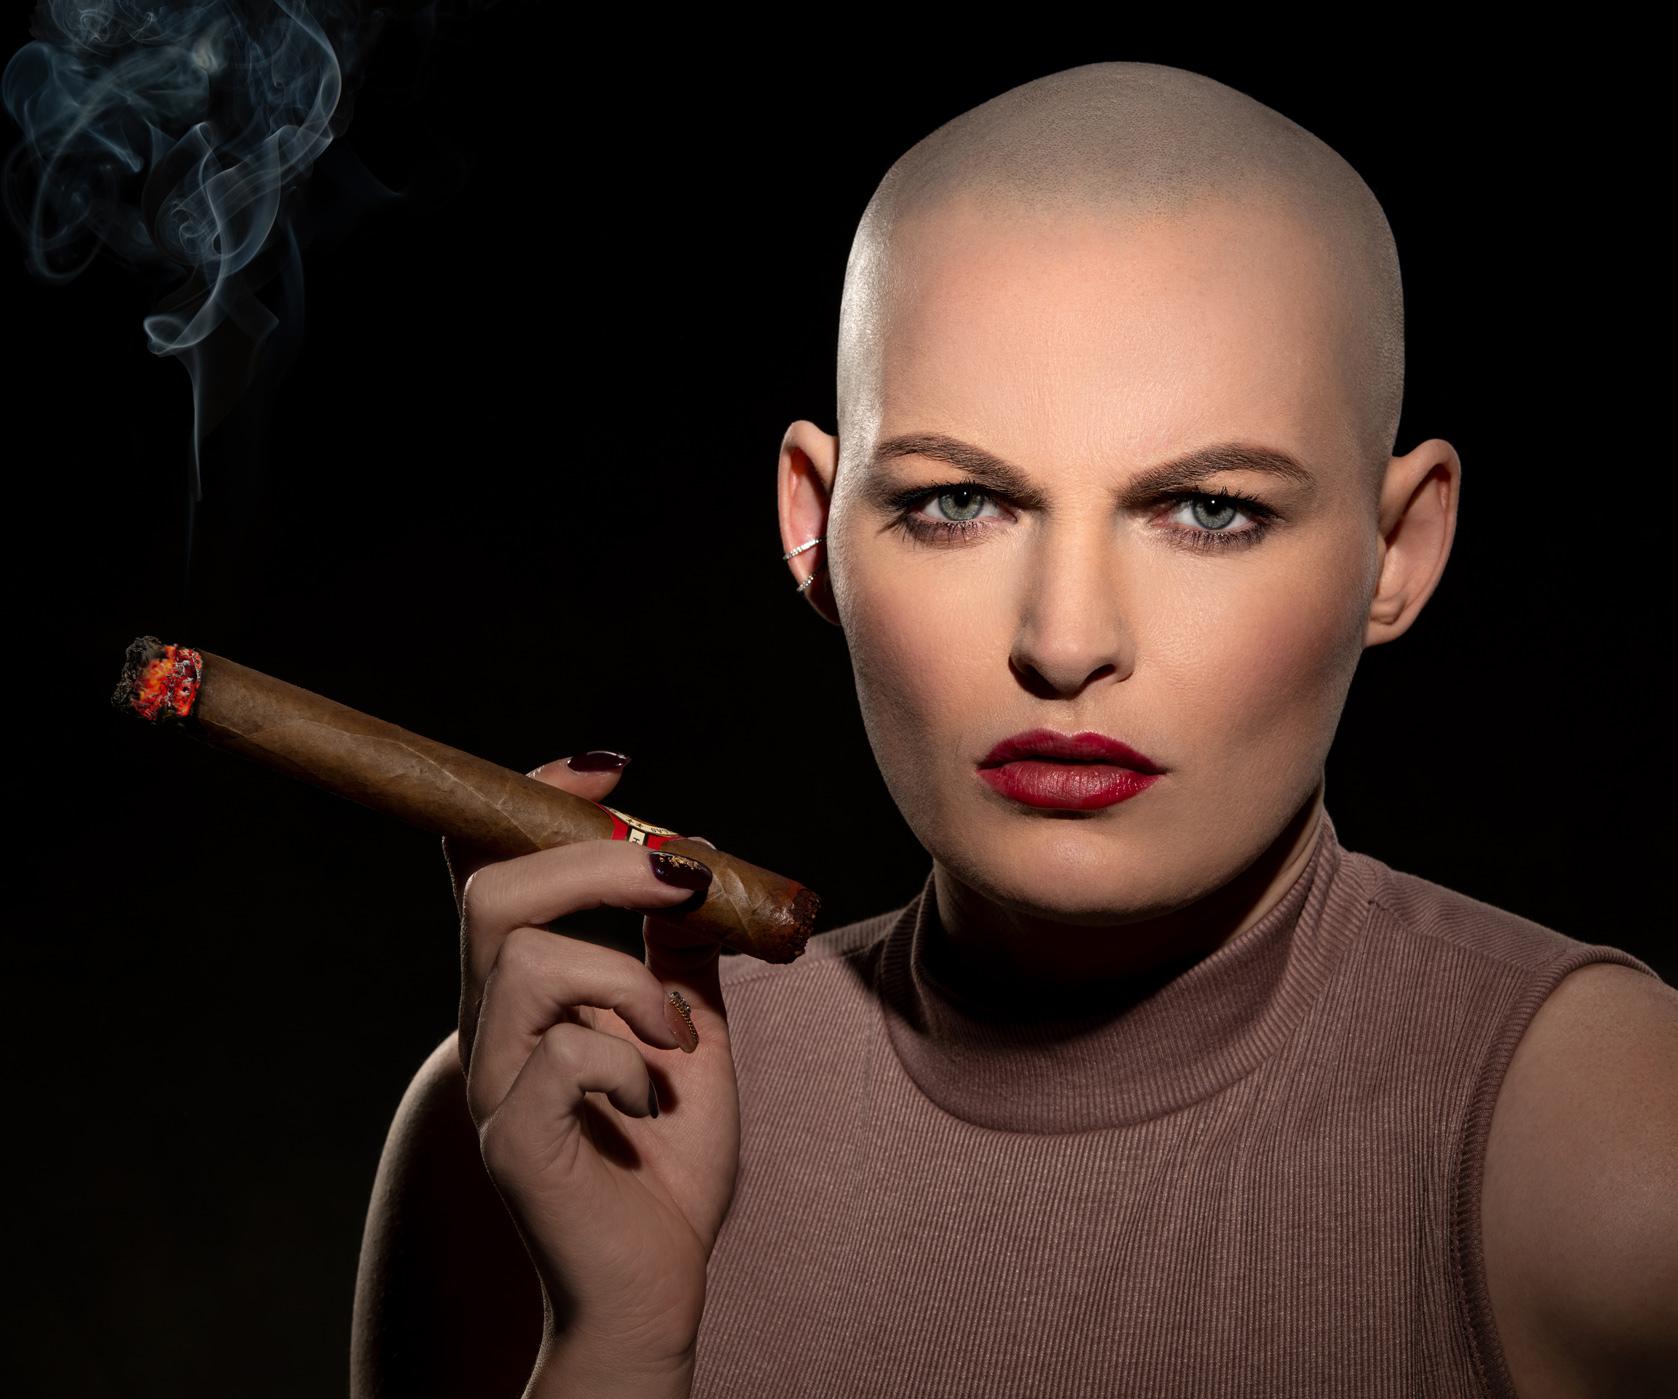 headshot of bald female model with cigar